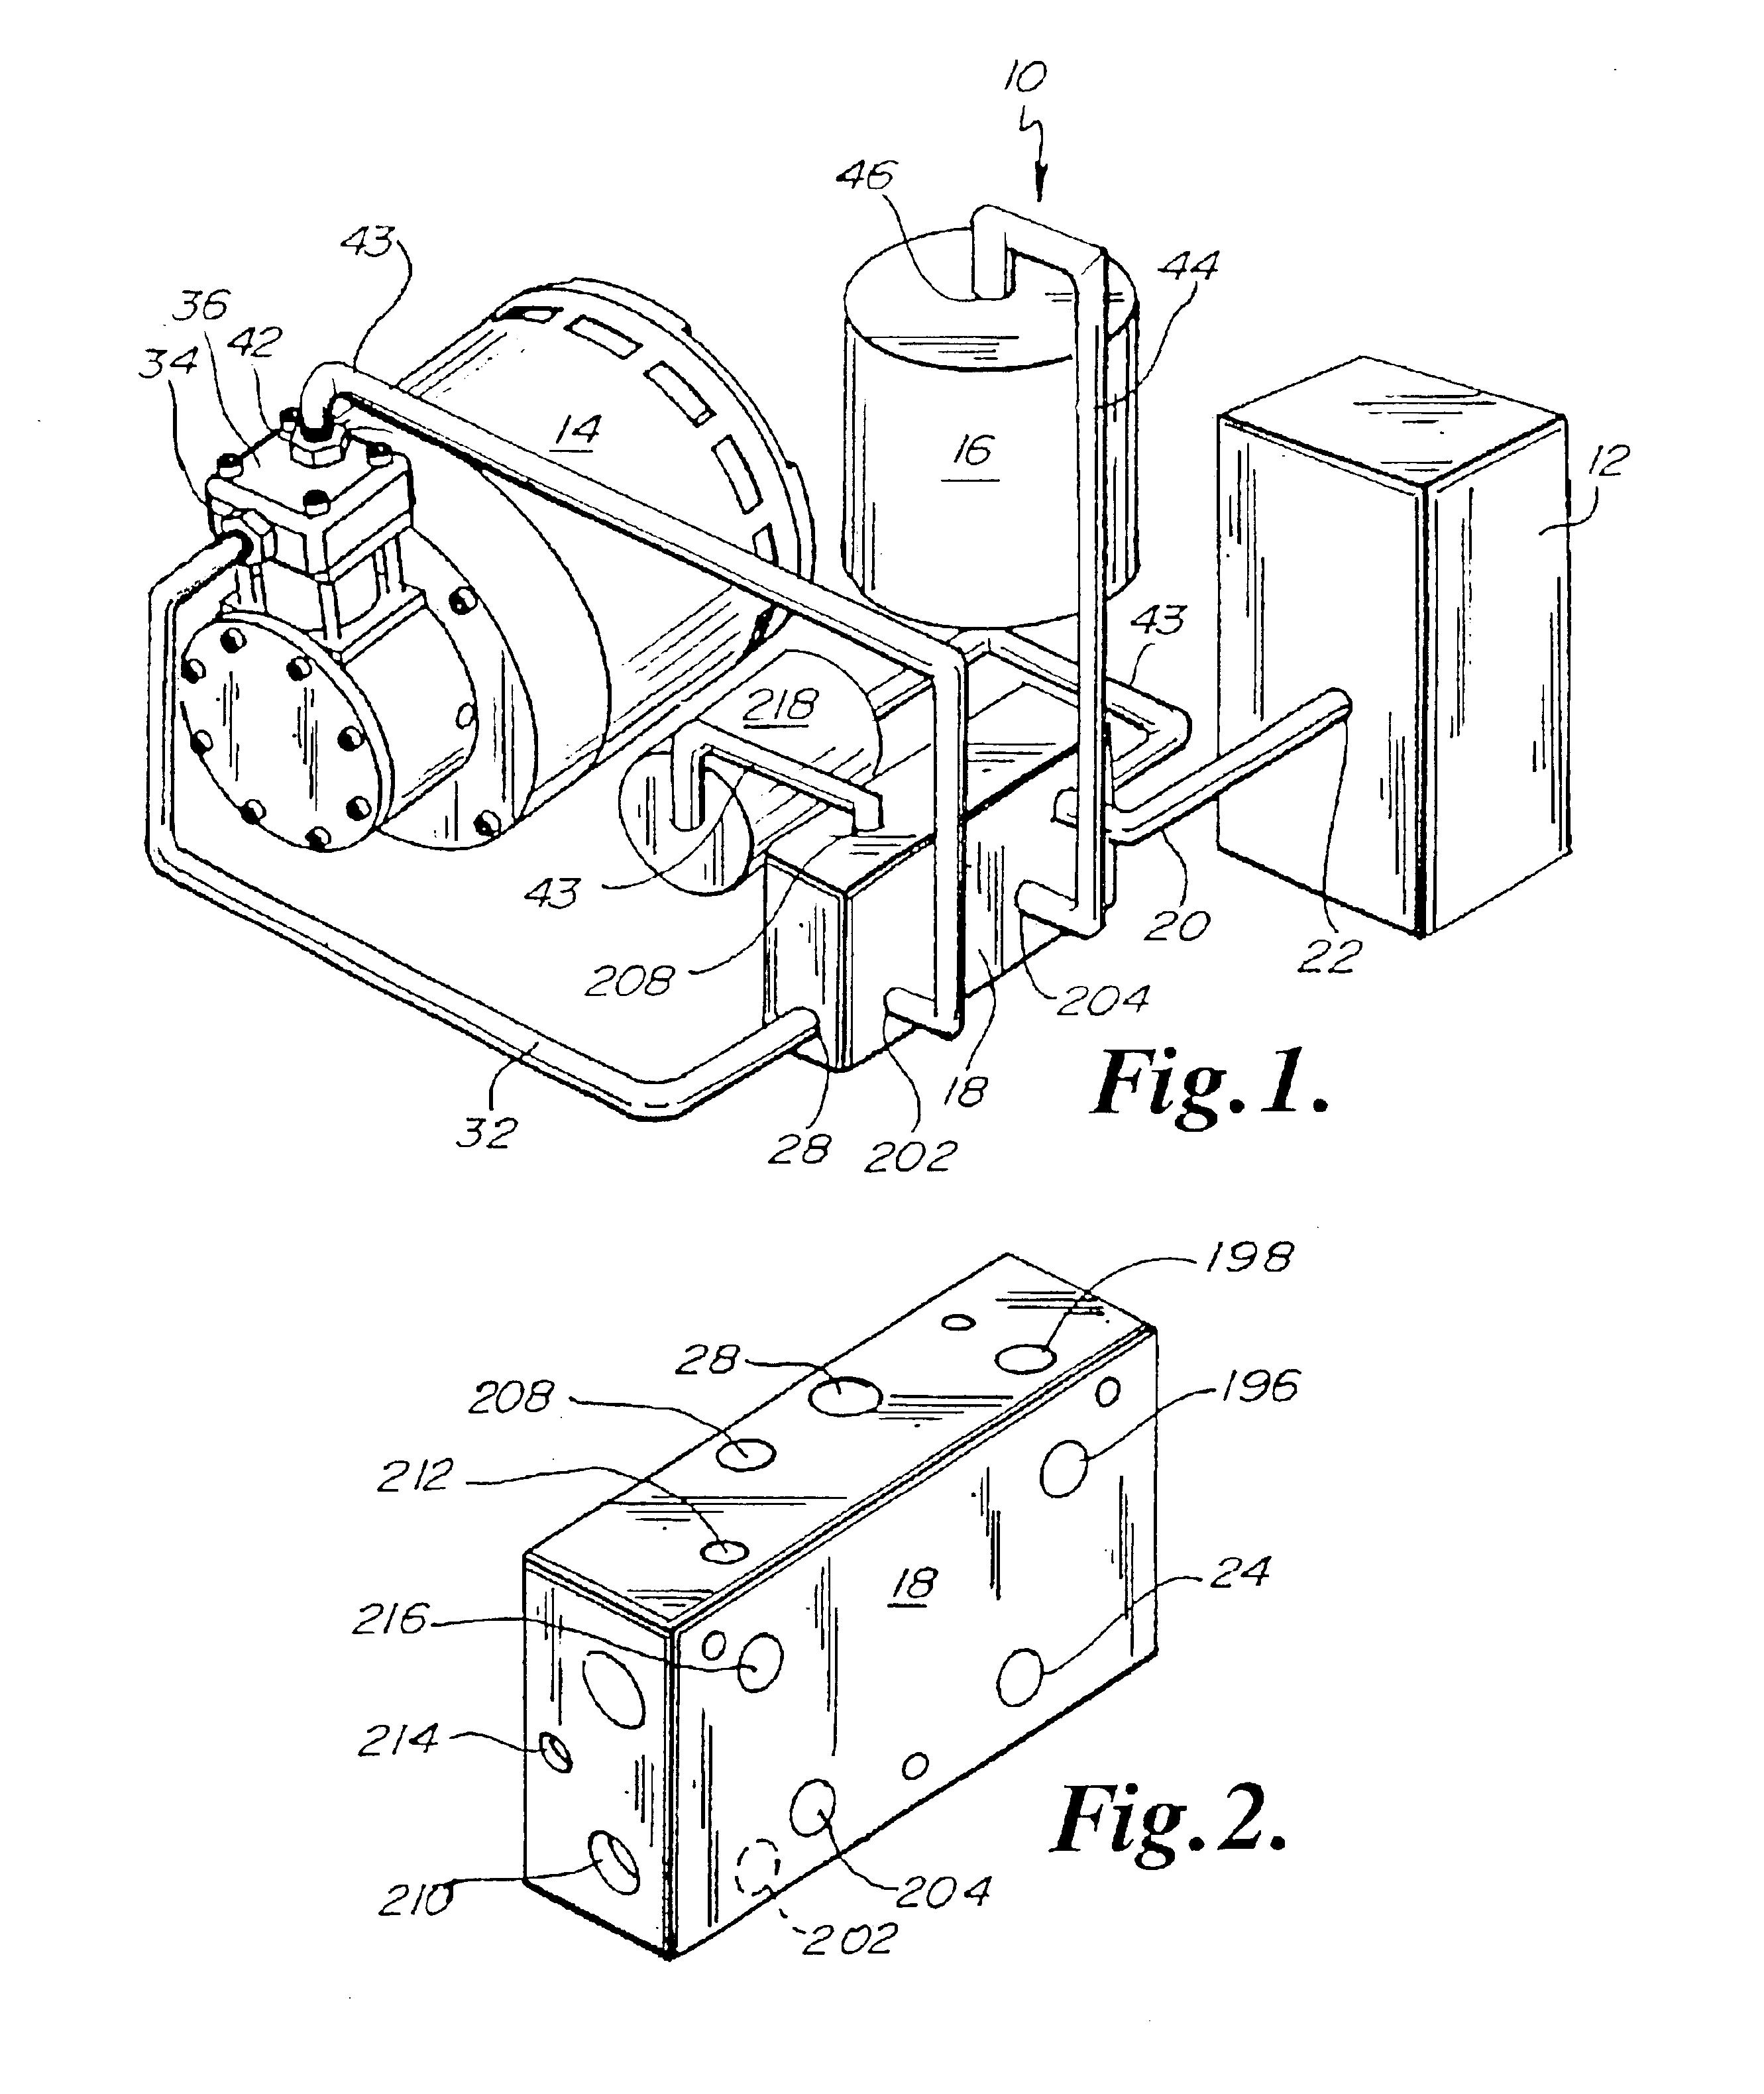 Patent Us6779350 Compressor Head Internal Discriminator External 2011 Toyota Avalon Fuse Box Drawing